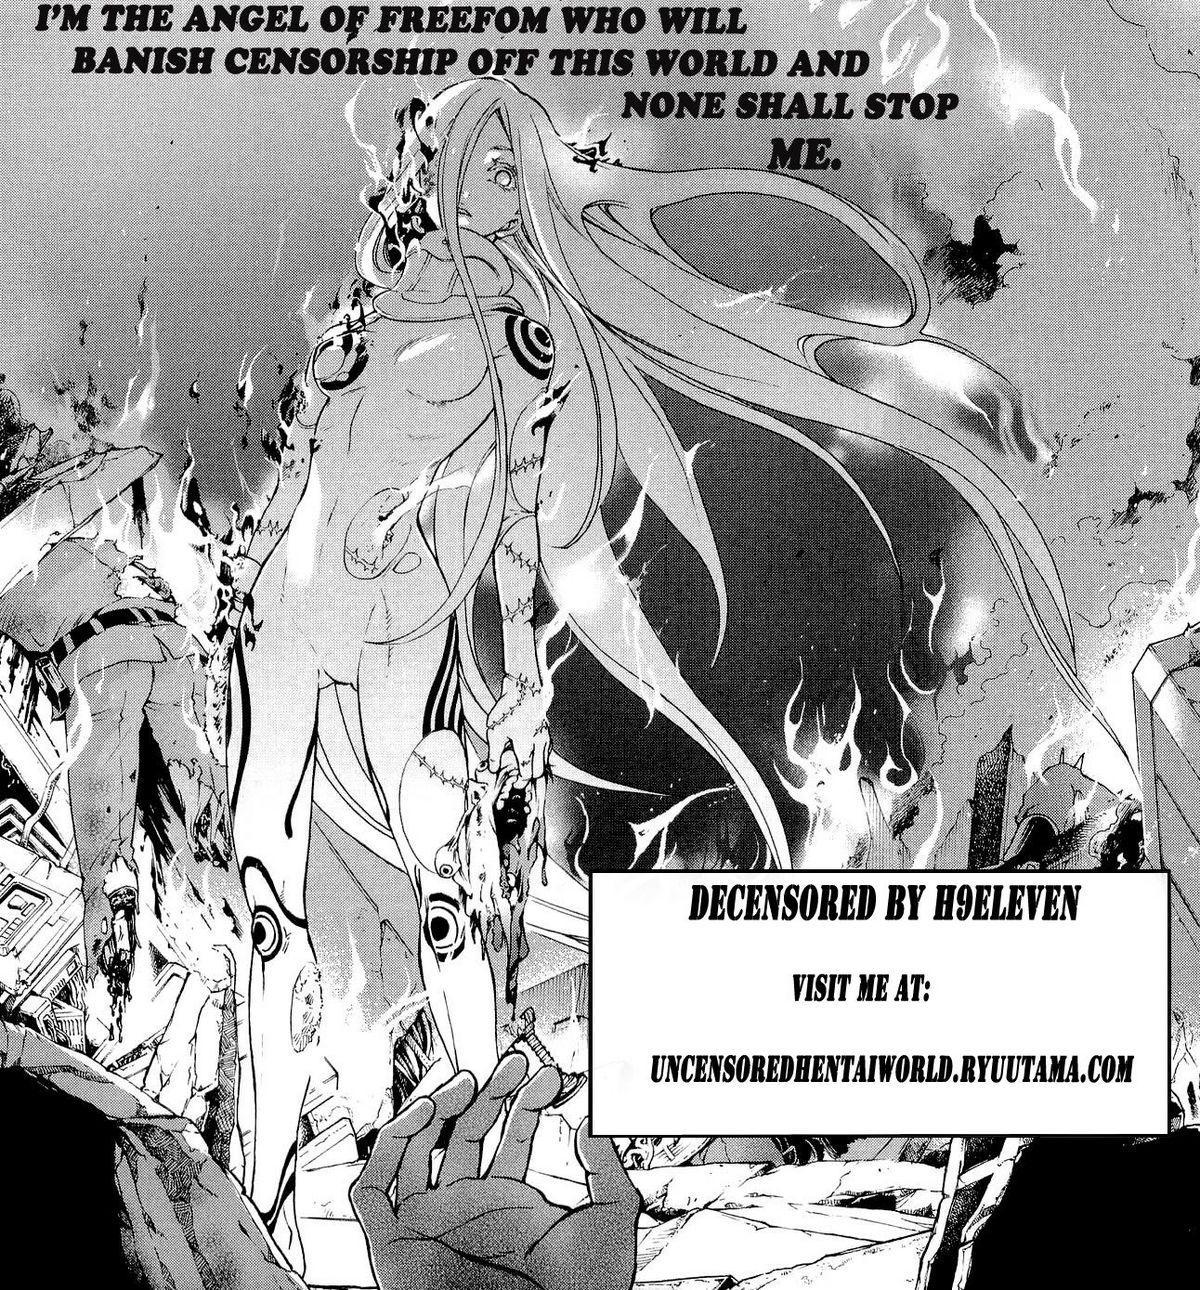 [Fujiwara Shunichi] Akogare no Hito - Woman of Yearning Ch. 1-2 [English] [FAYTEAR] [Decensored] 41